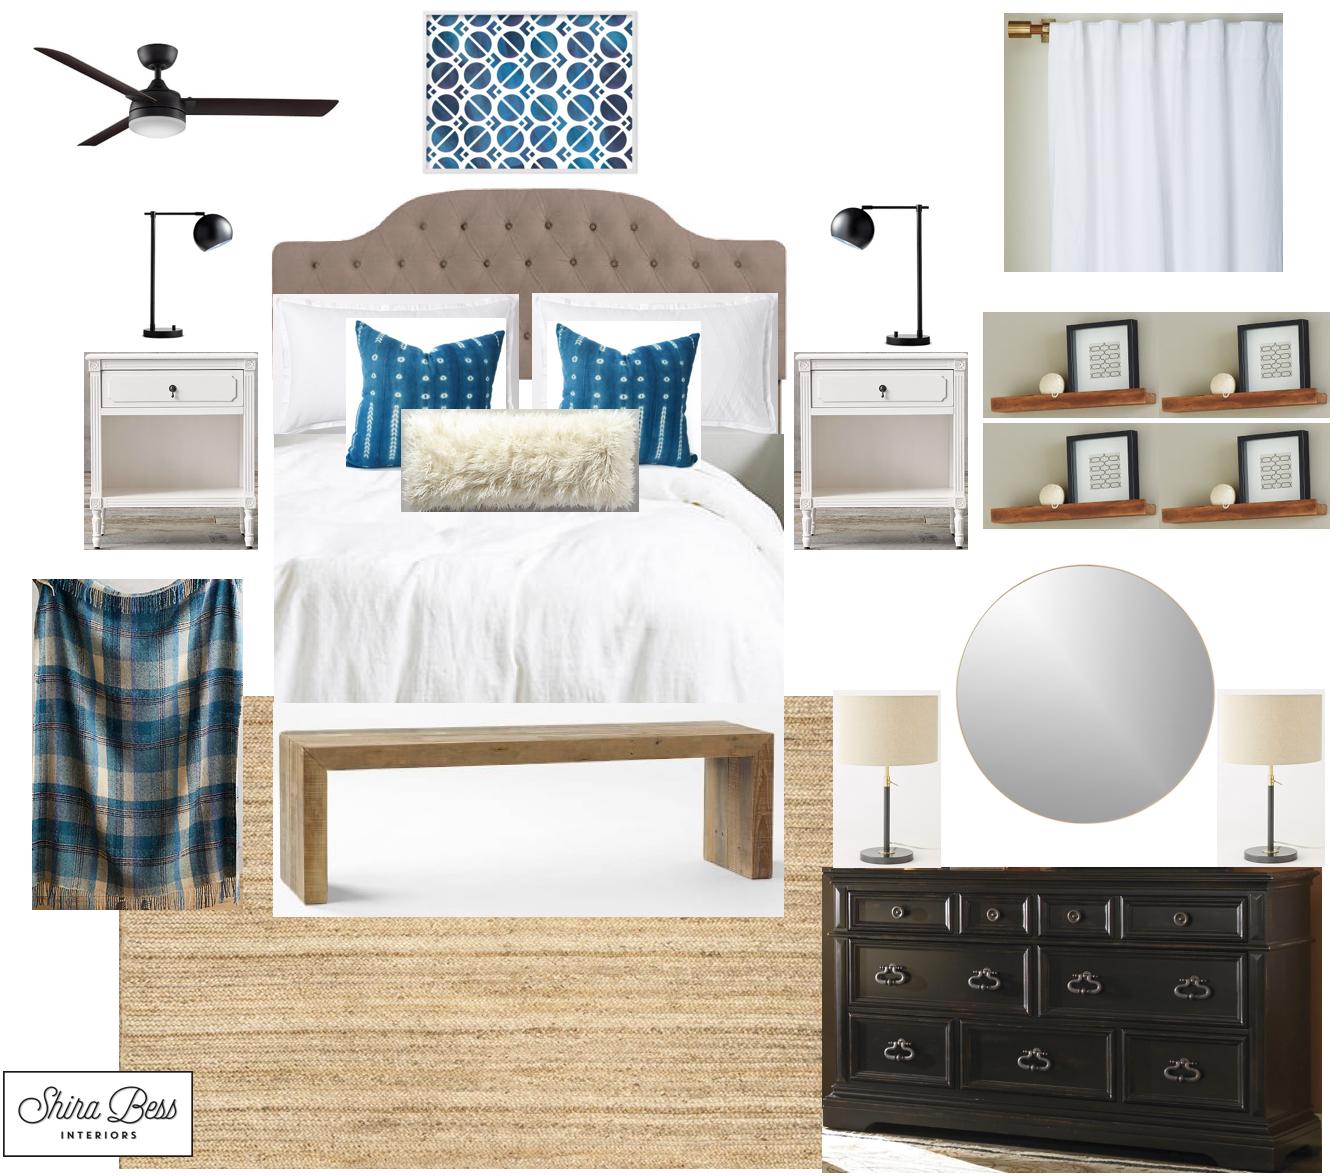 Indiana Master Bedroom - Option 3